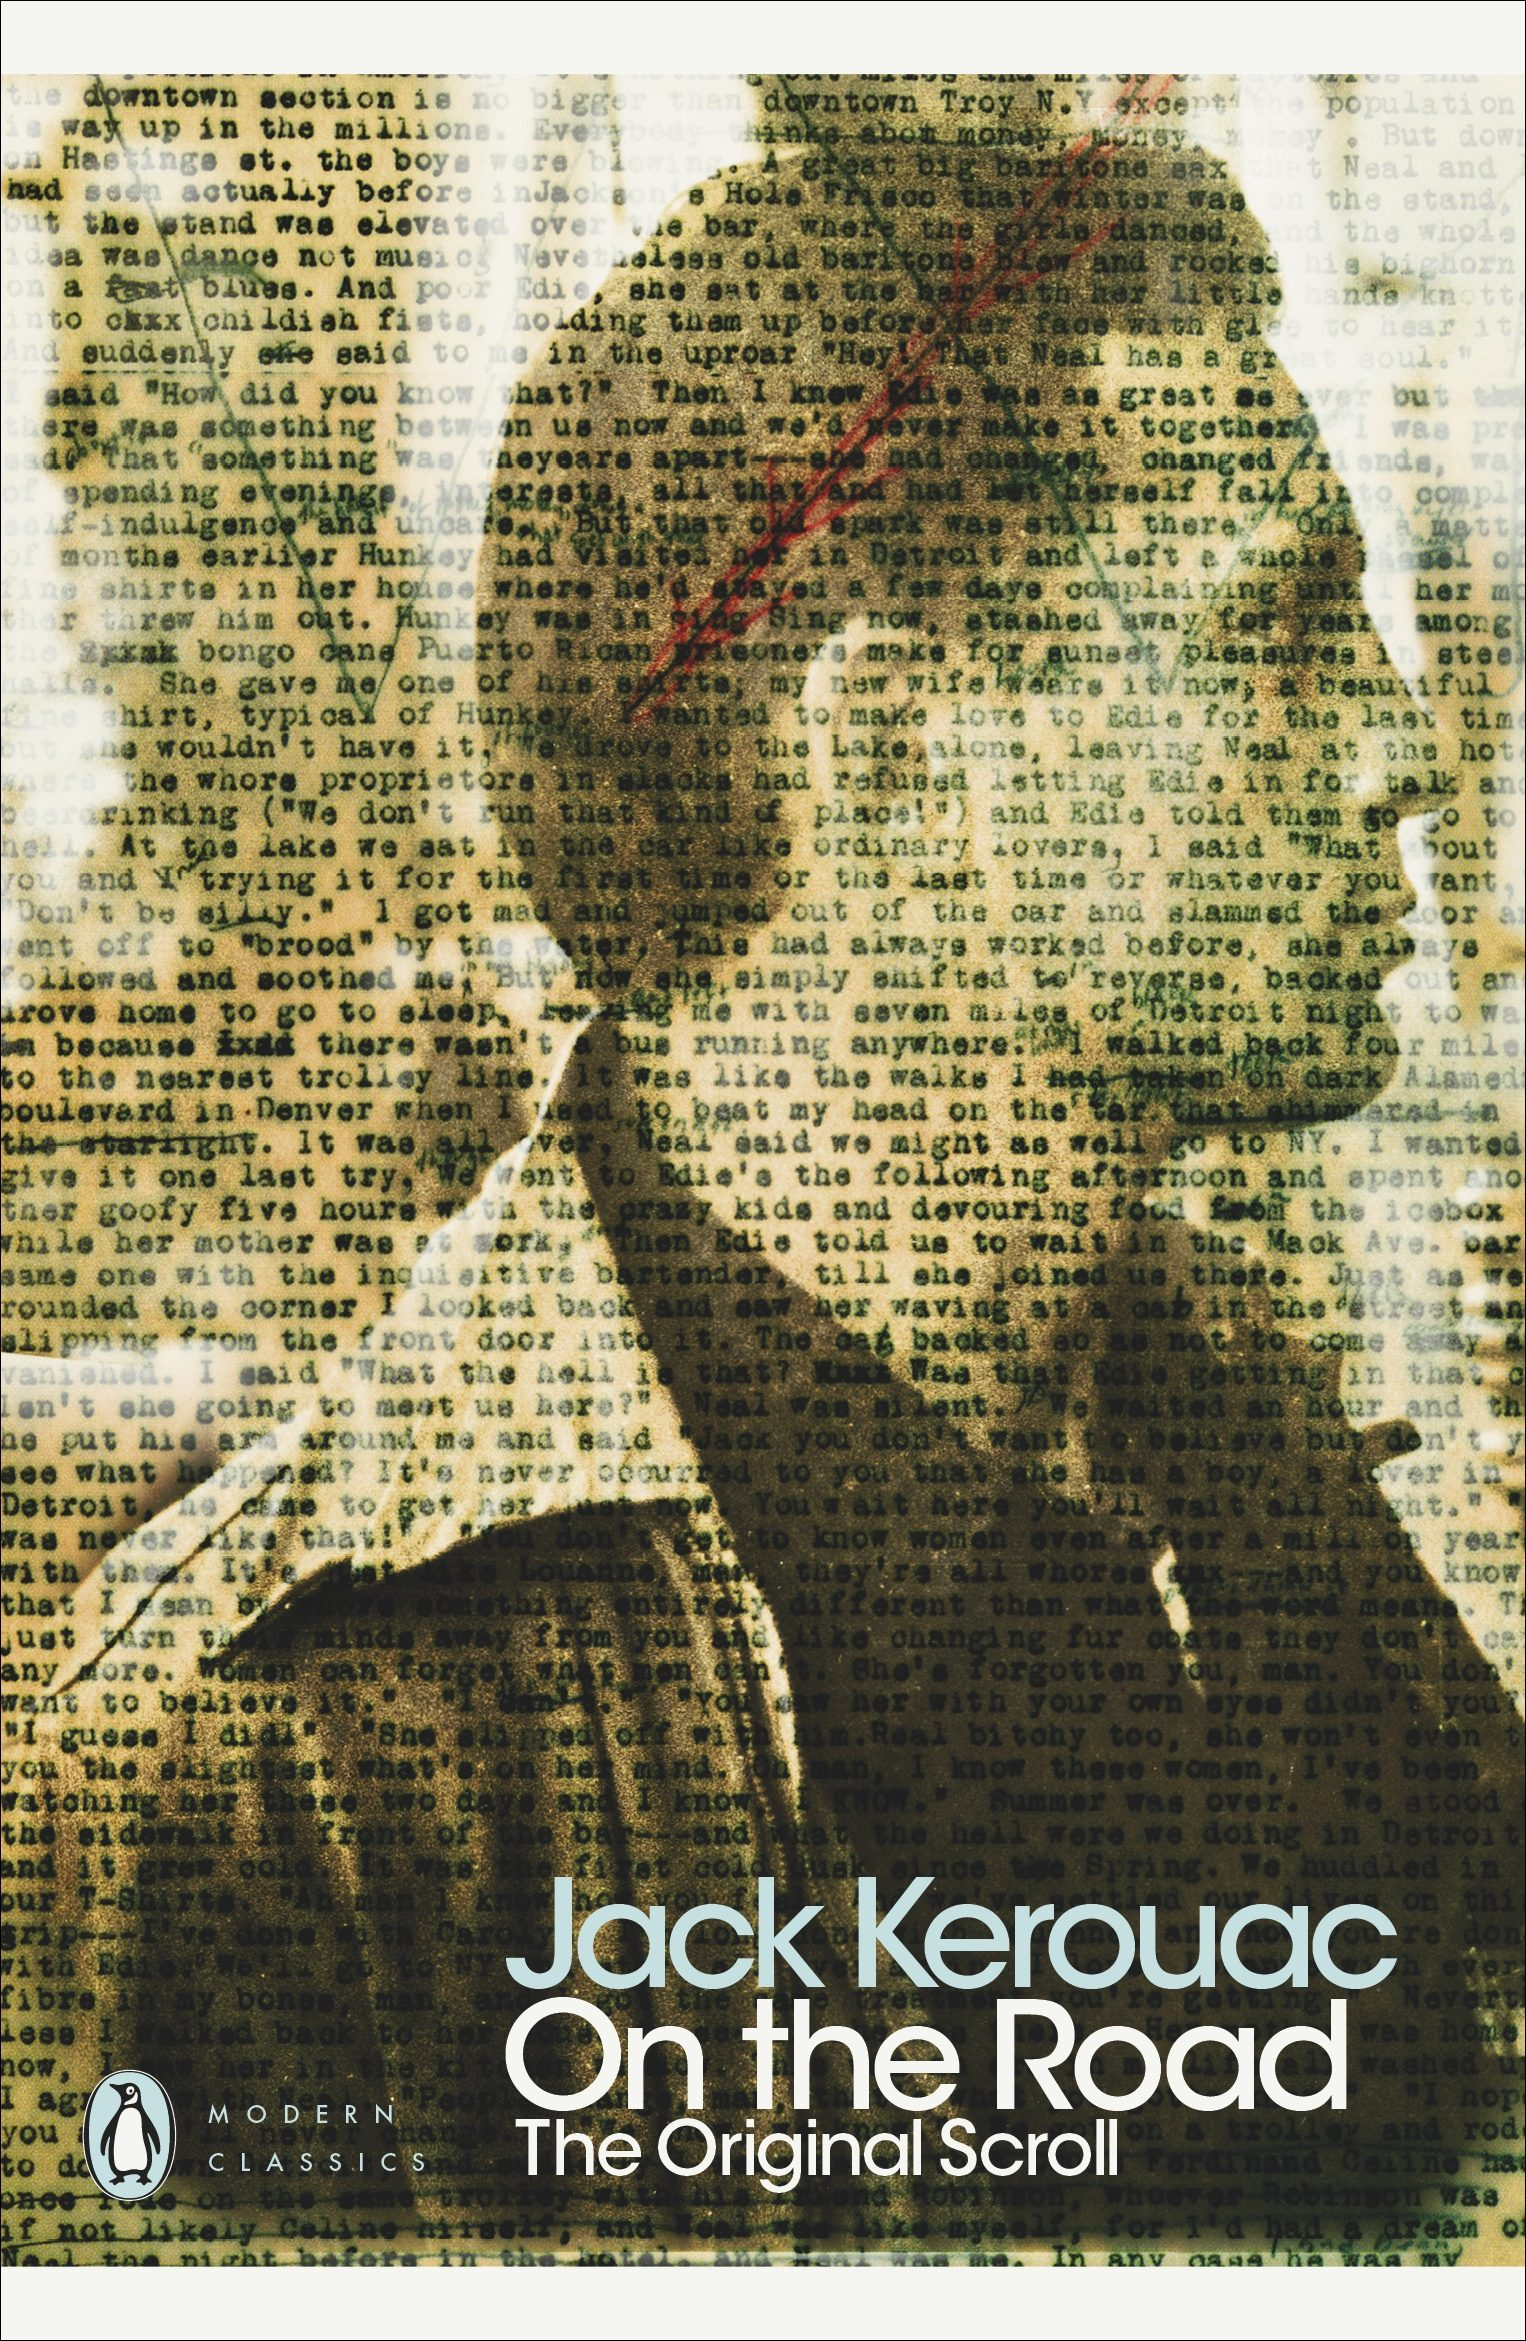 On The Road The Original Scroll Ebook Jack Kerouac Descargar